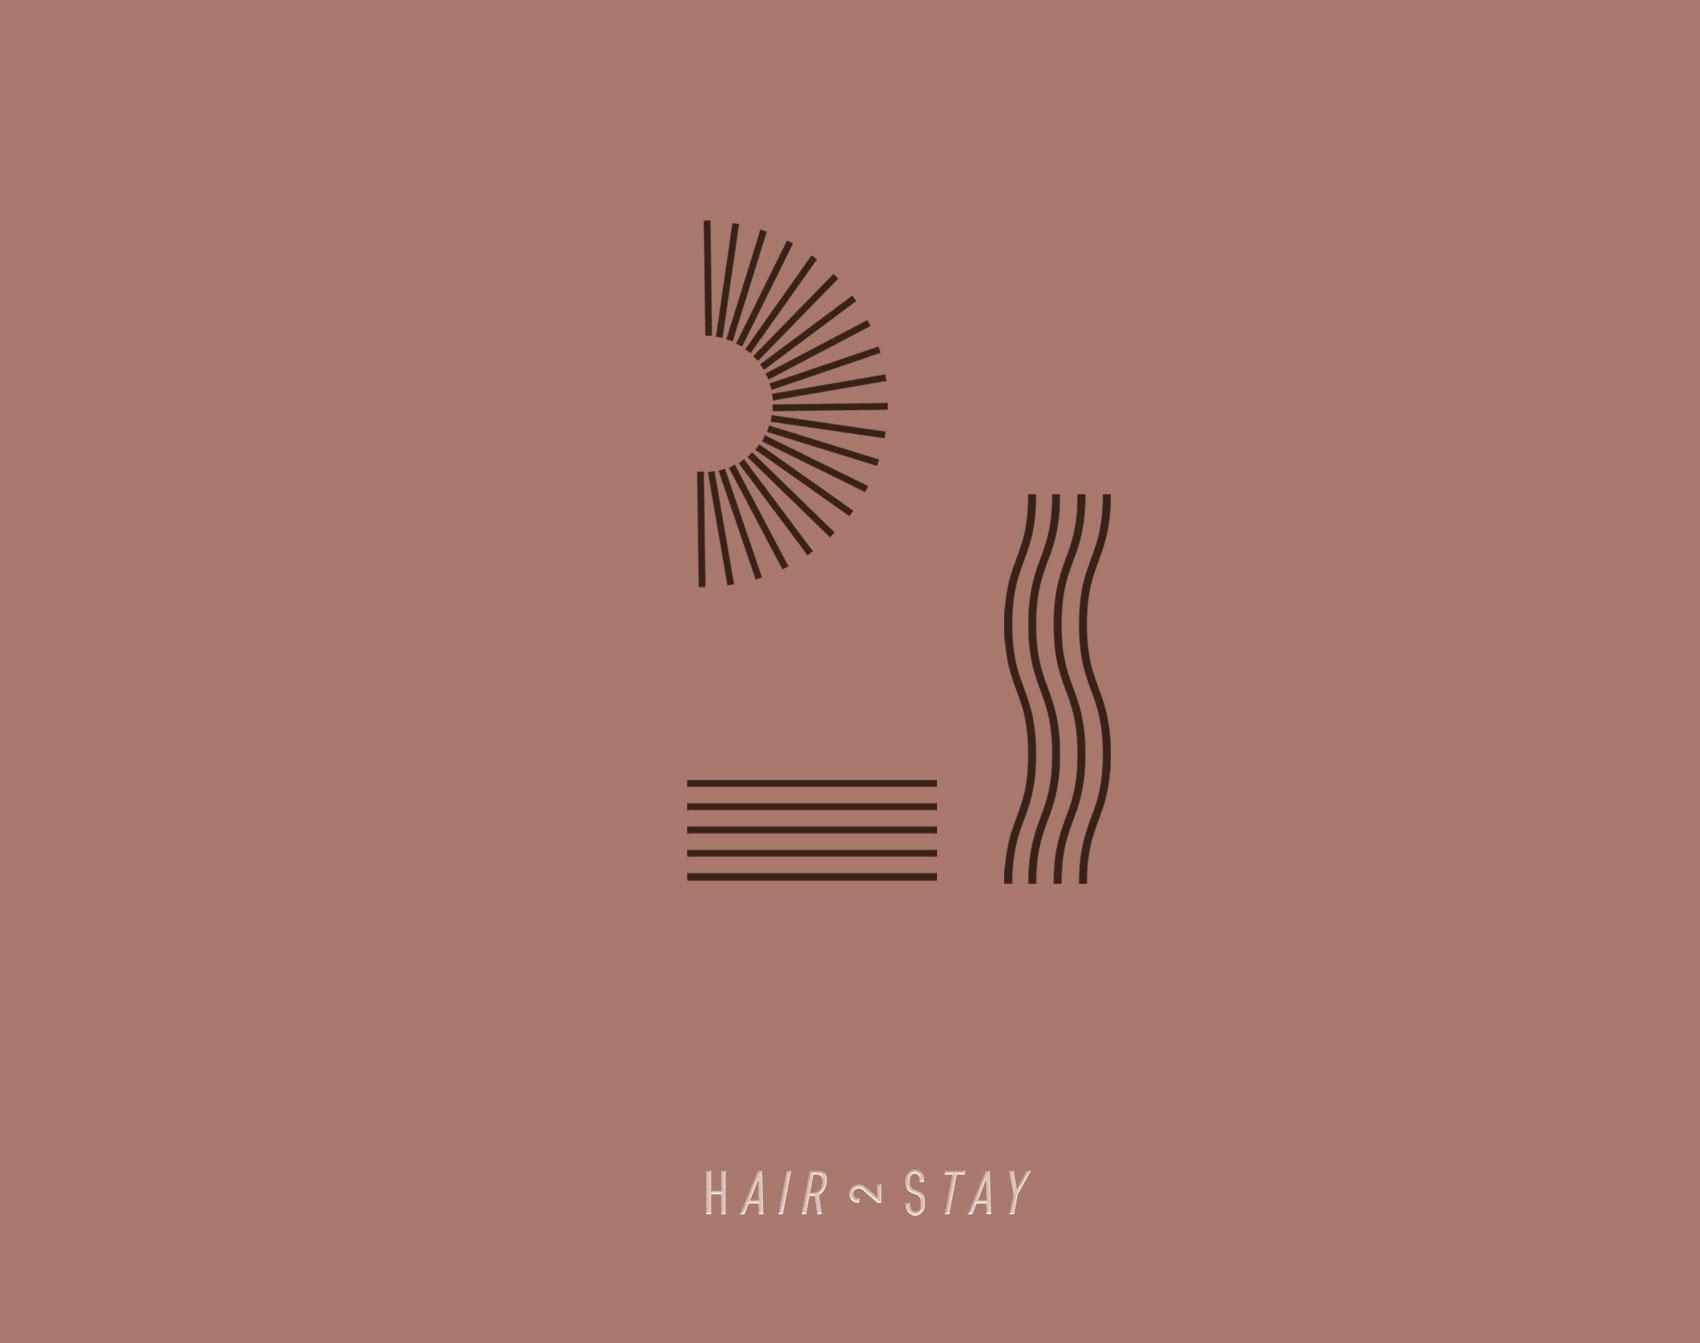 Hair-Salon-Logo-Stationary-Design-LoolaaDesigns-3.jpg